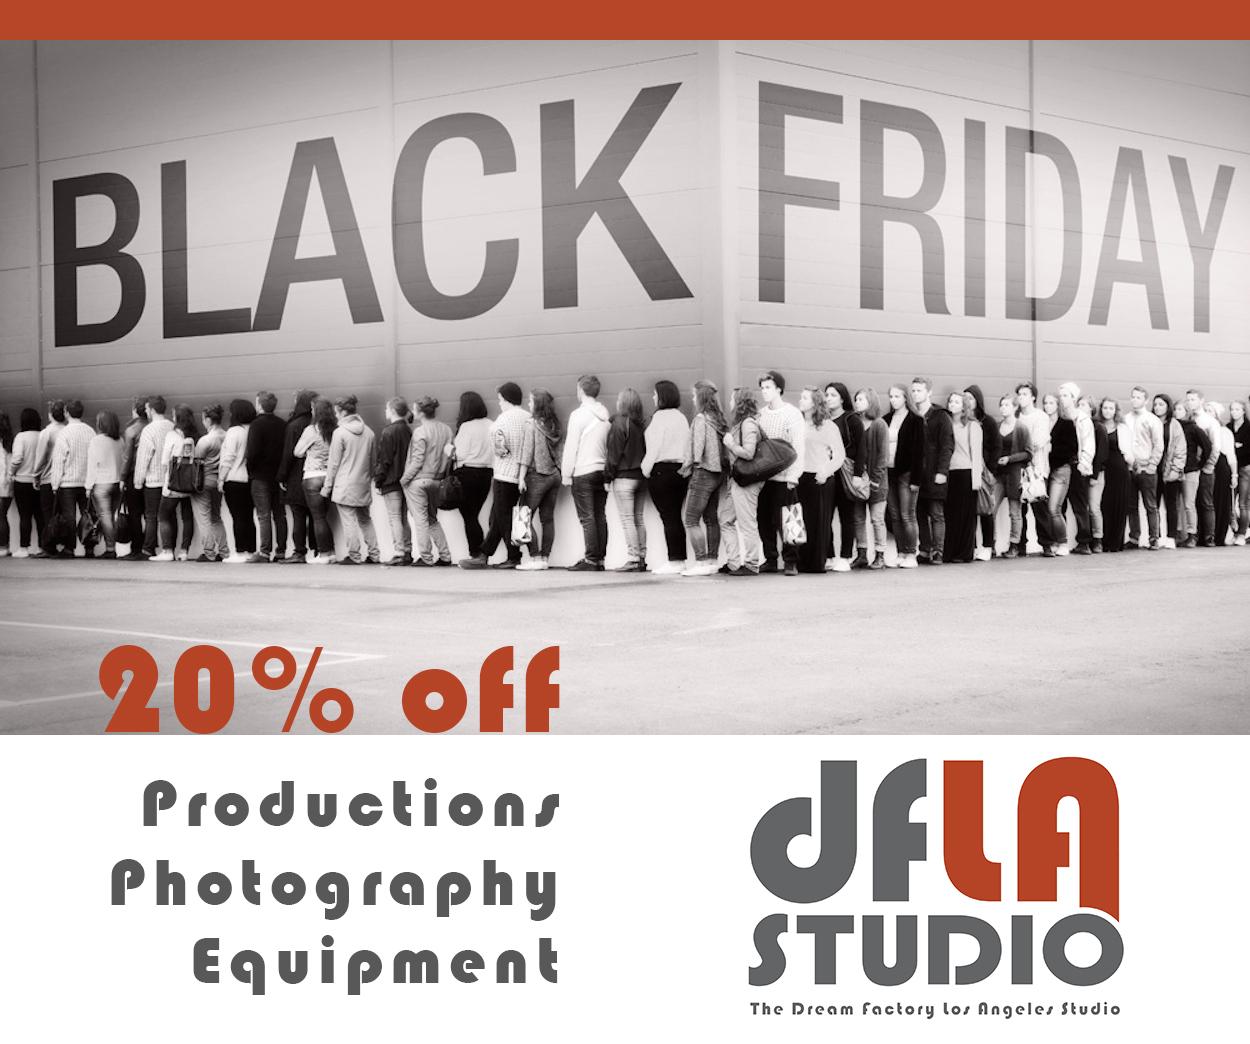 DFLA-Studio-black-friday-2017-AD.jpg